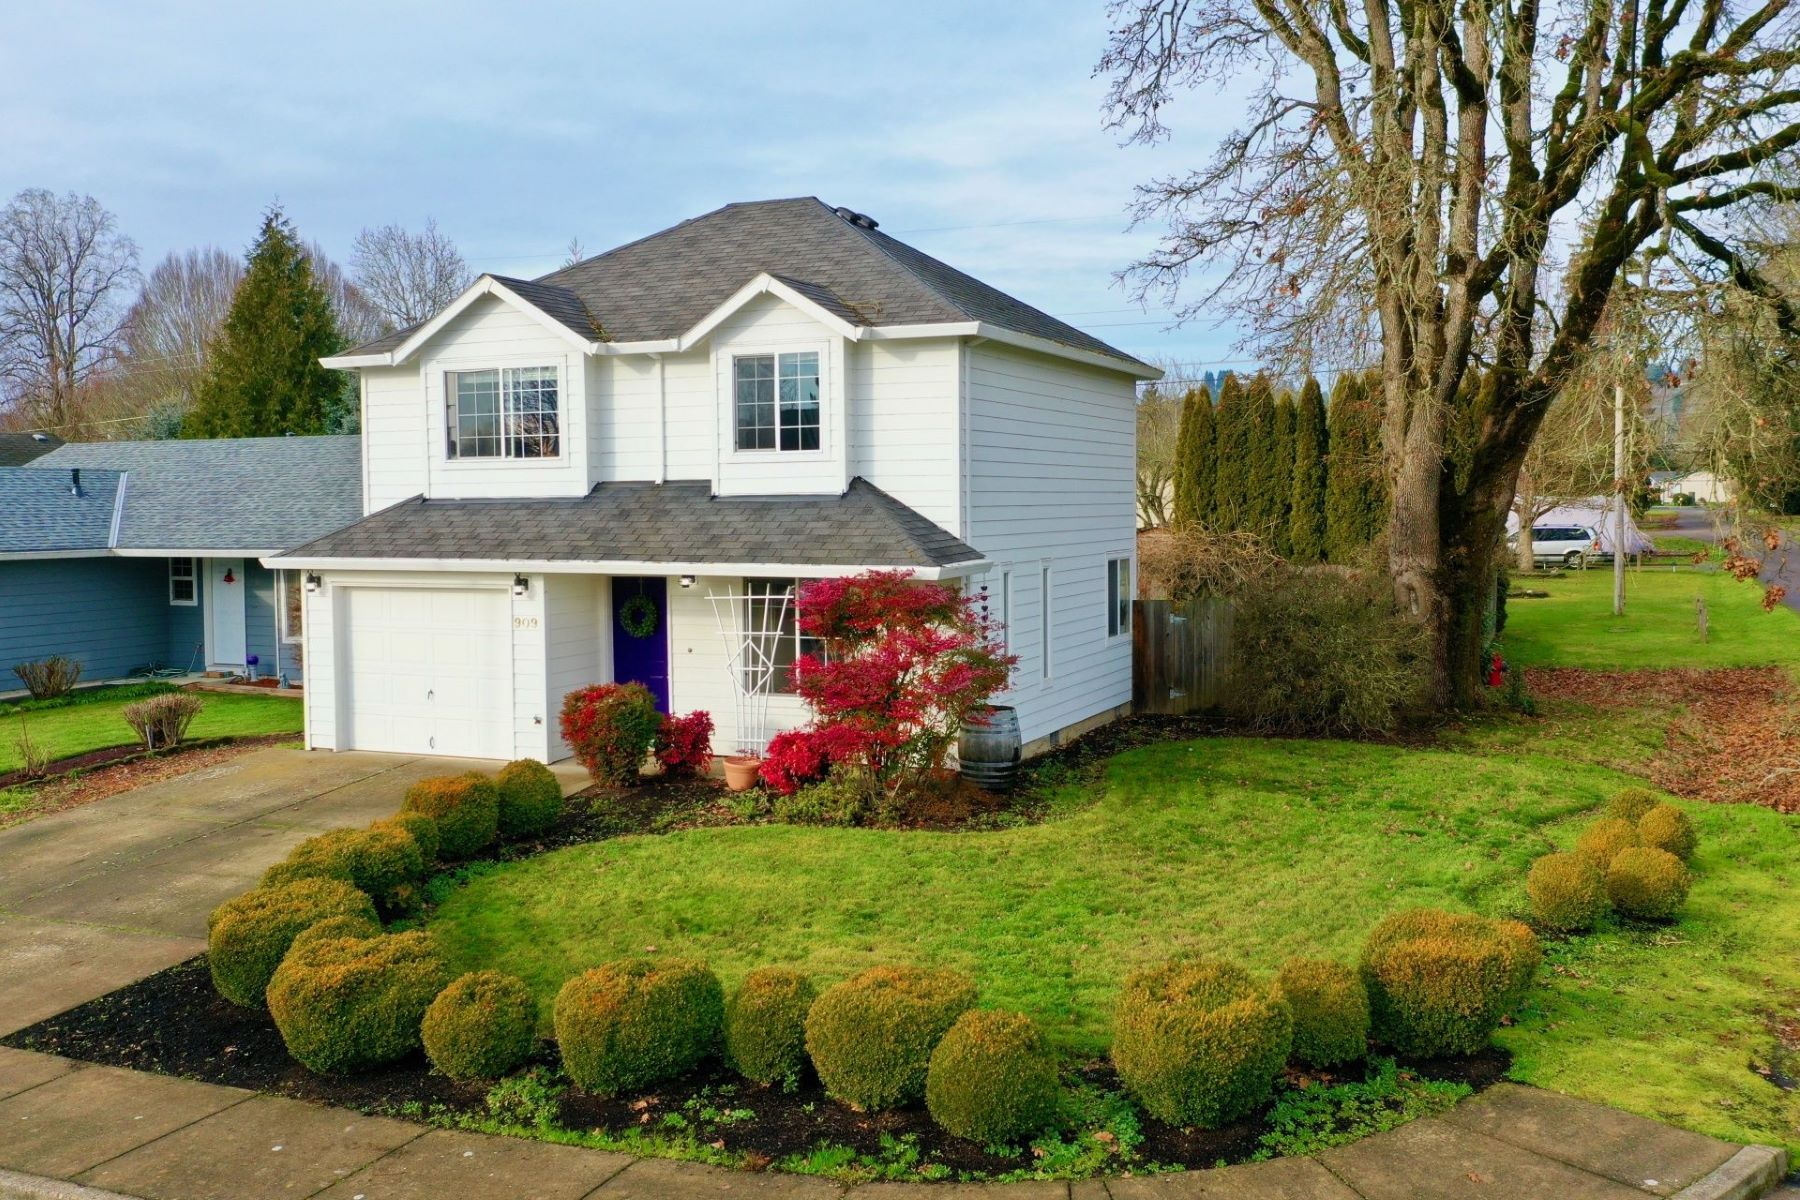 Other Residential Homes για την Πώληση στο 909 SE OAK ST Dundee, OR 97115 Dundee, Ορεγκον 97115 Ηνωμένες Πολιτείες